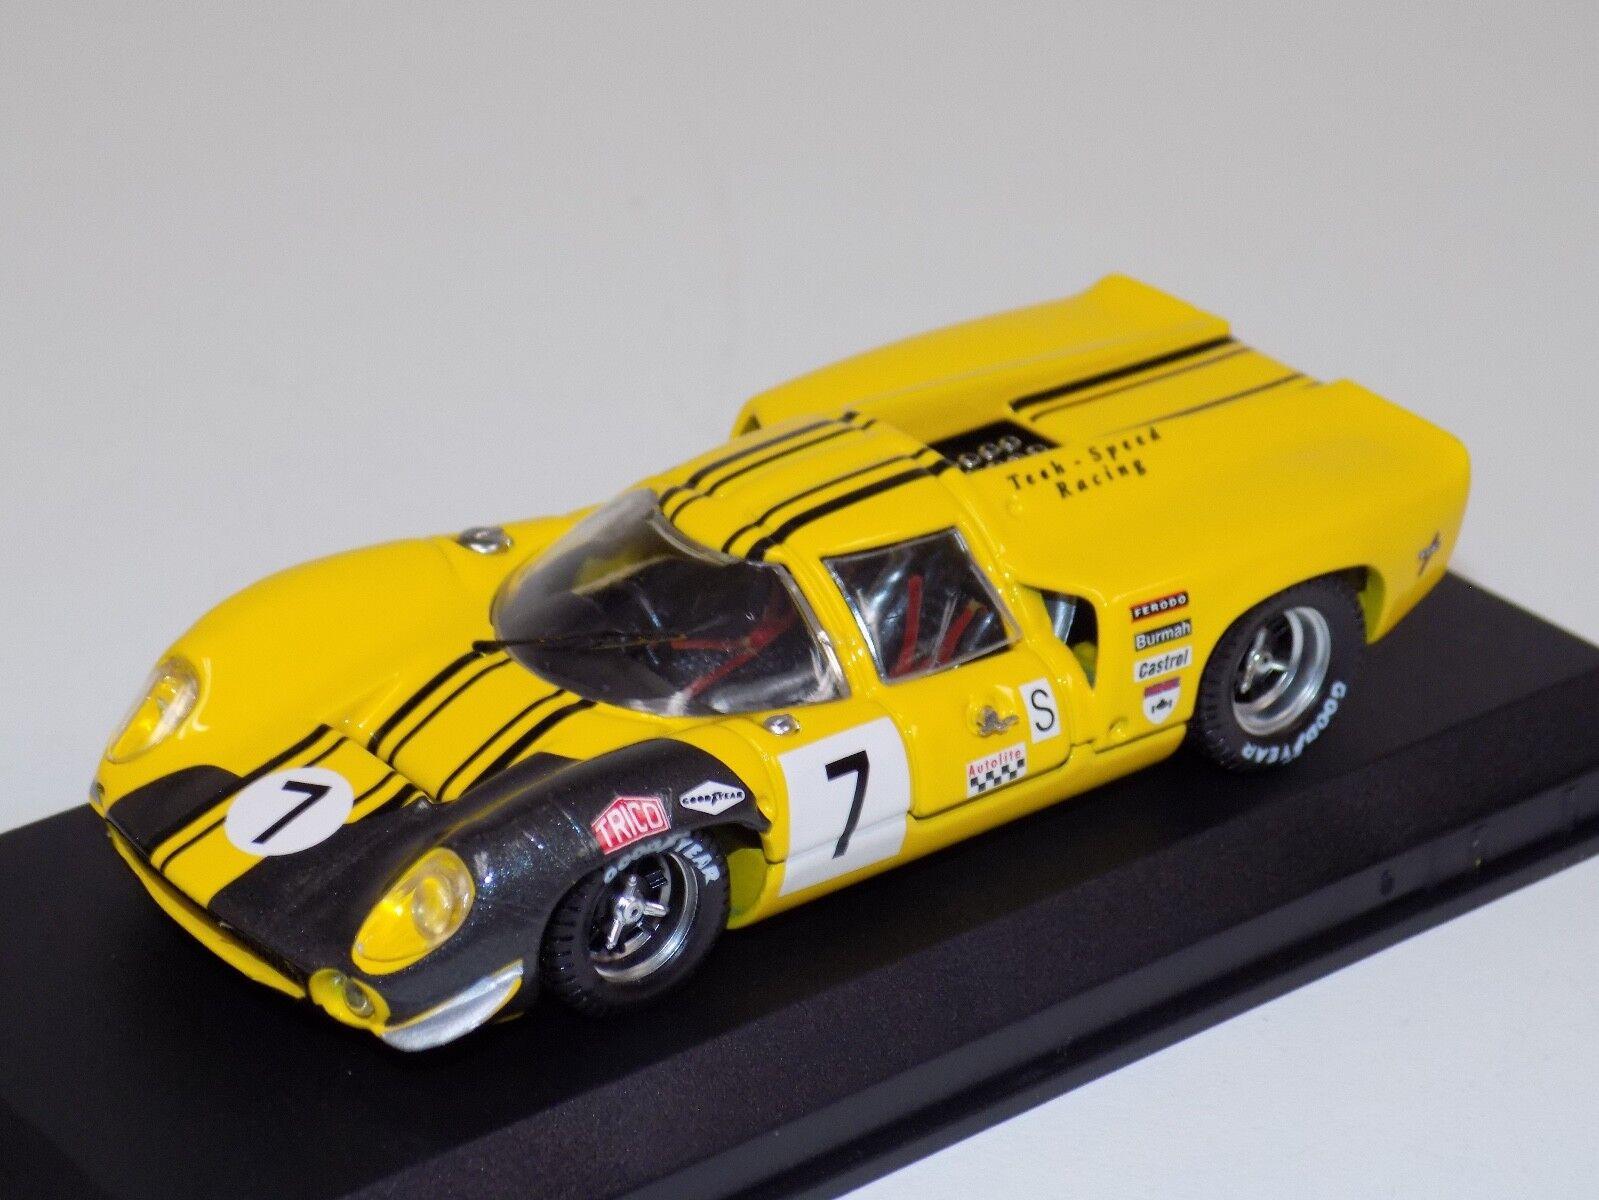 1 43 mejor modelo Lola T70 Coupe Coche  7 de 1969 marca escotilla  9283